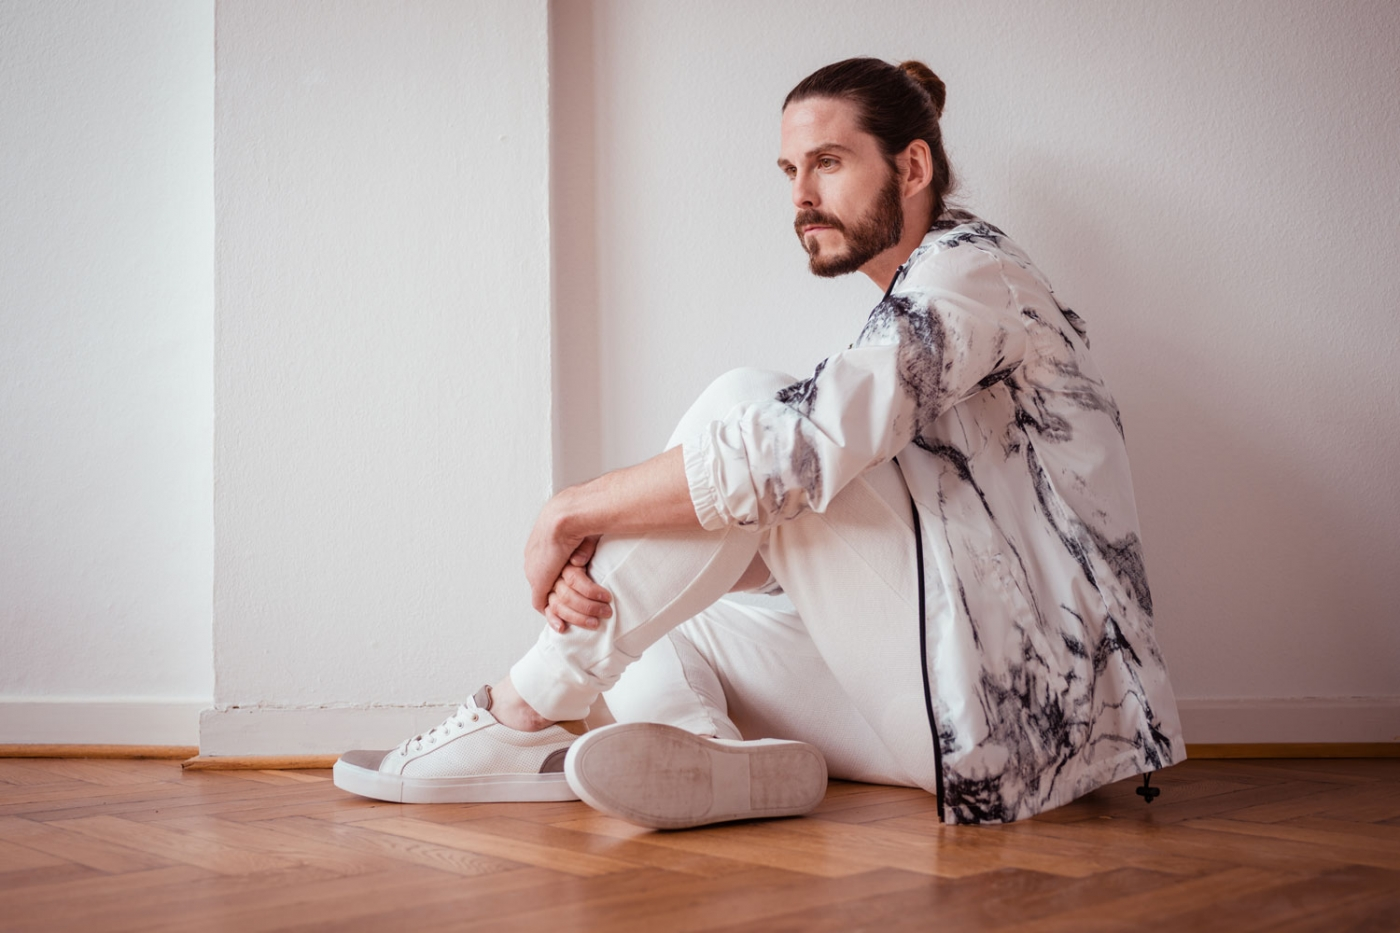 malefashionblog-kaisers-neue-kleider-editorial-herbst-trends-anzug-streetwear-shirt-kombination-maennerstyle